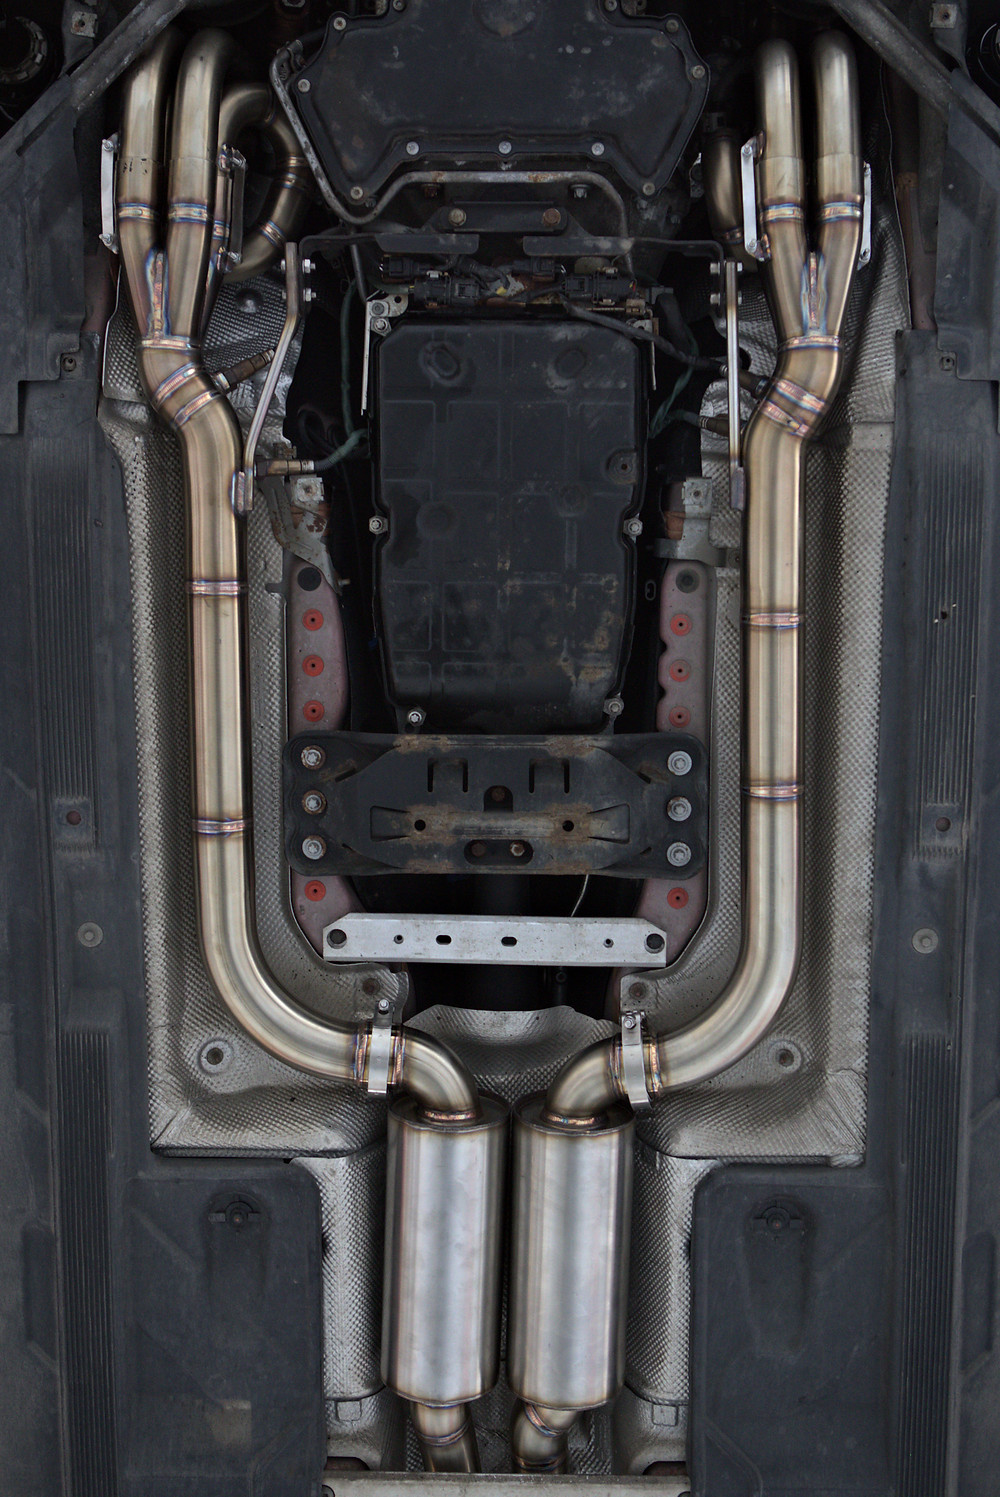 Mercedes C63 AMG Manifolds